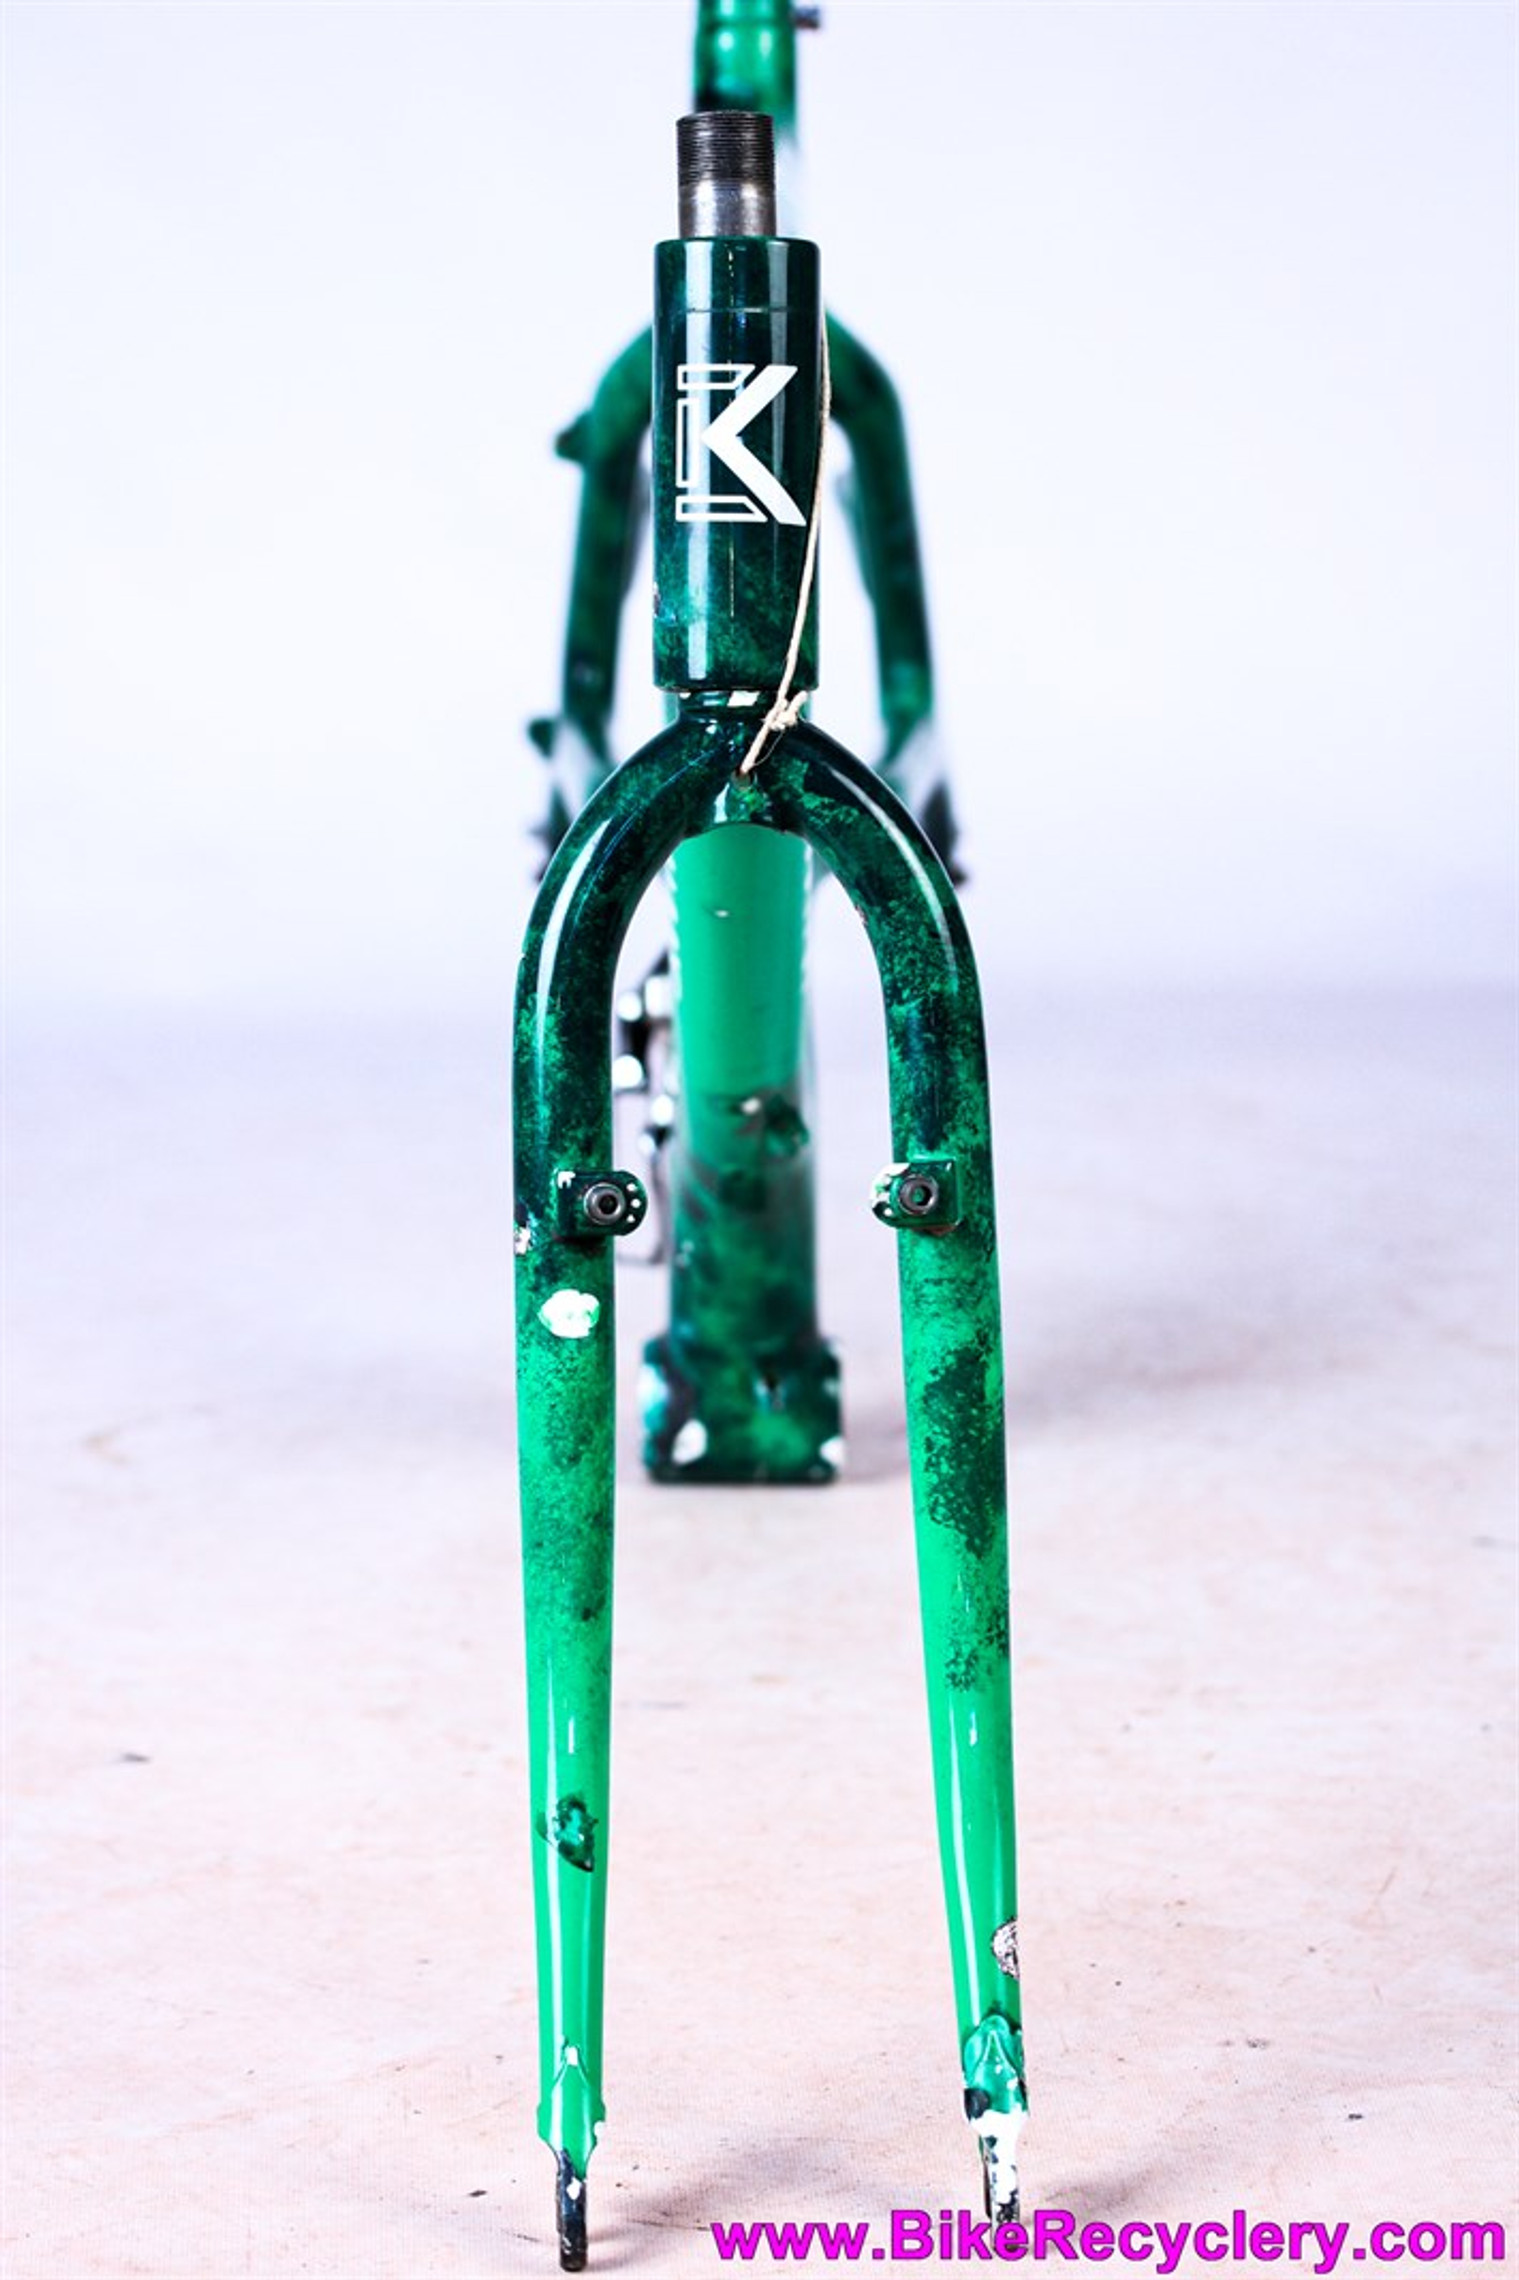 "1989 Kestrel MX-Z MTB Frame &  Fork: 19"" - First Mountain Bike Monocoque Carbon Frame! - CyclArt"